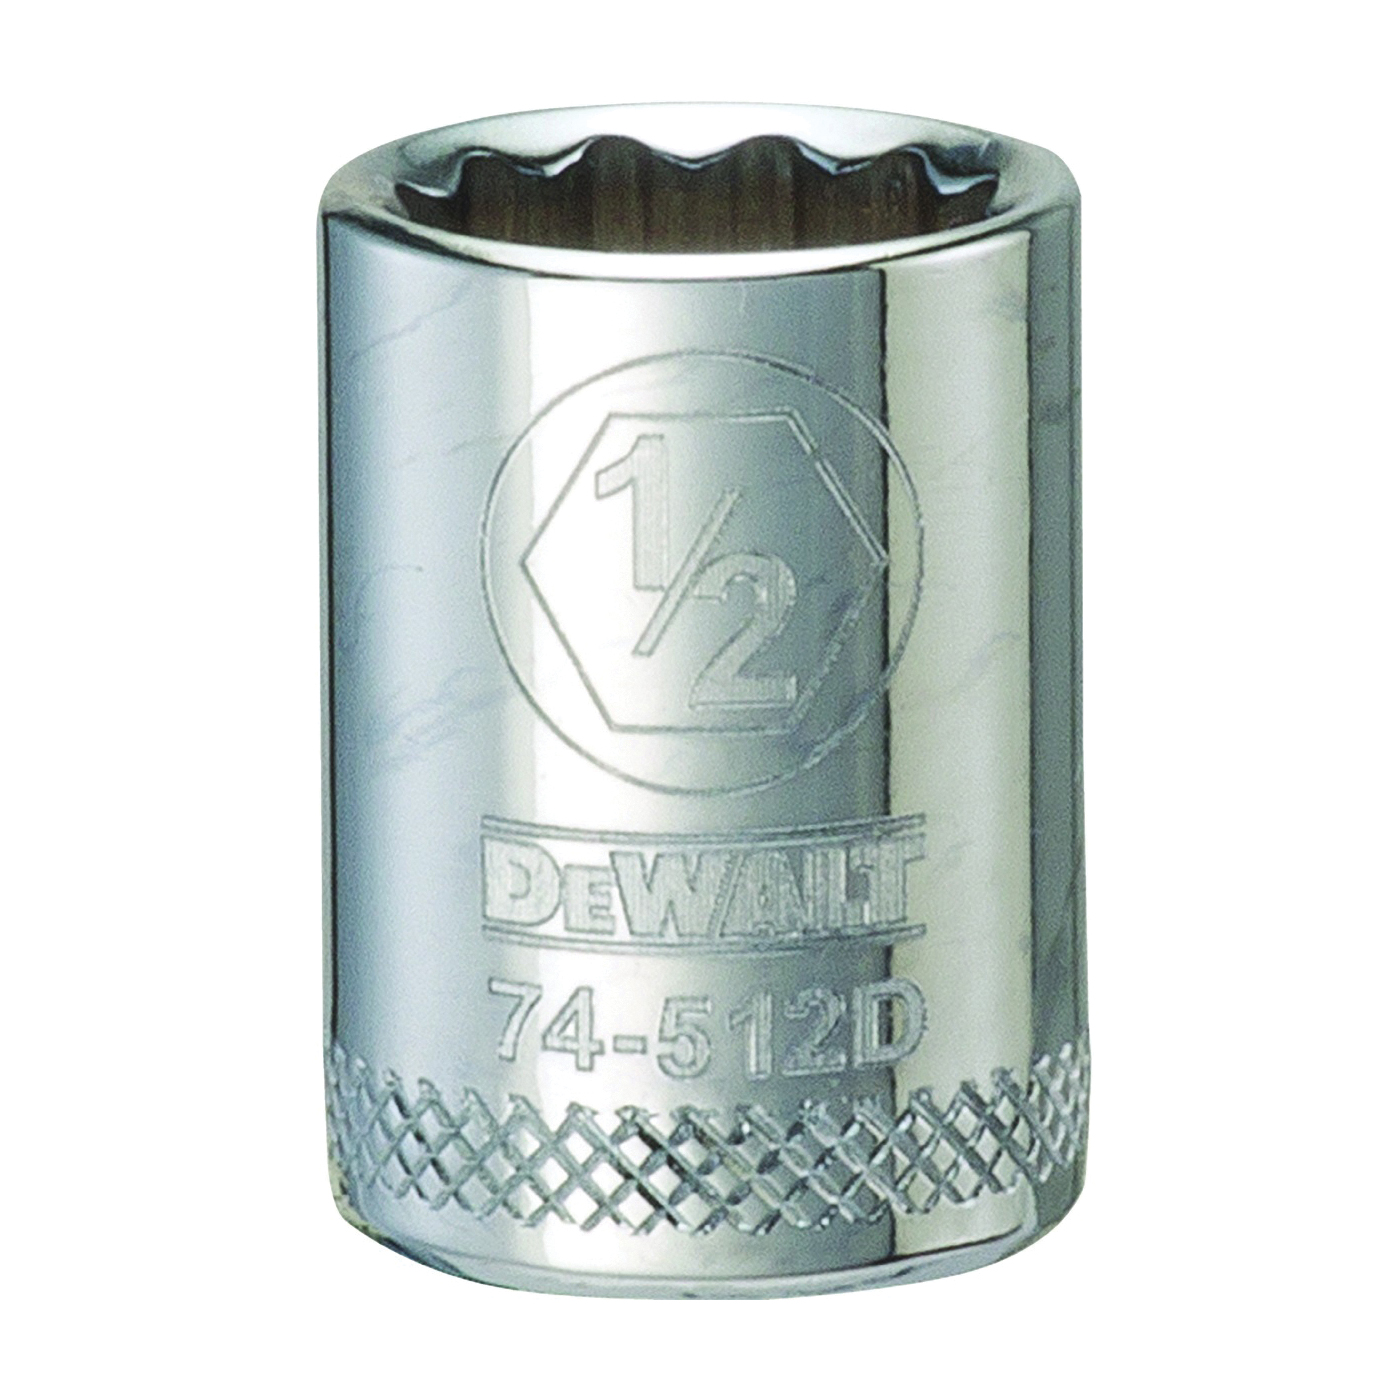 Picture of DeWALT DWMT74512OSP Hand Socket, 1/2 in Socket, 3/8 in Drive, 12 -Point, Vanadium Steel, Polished Chrome